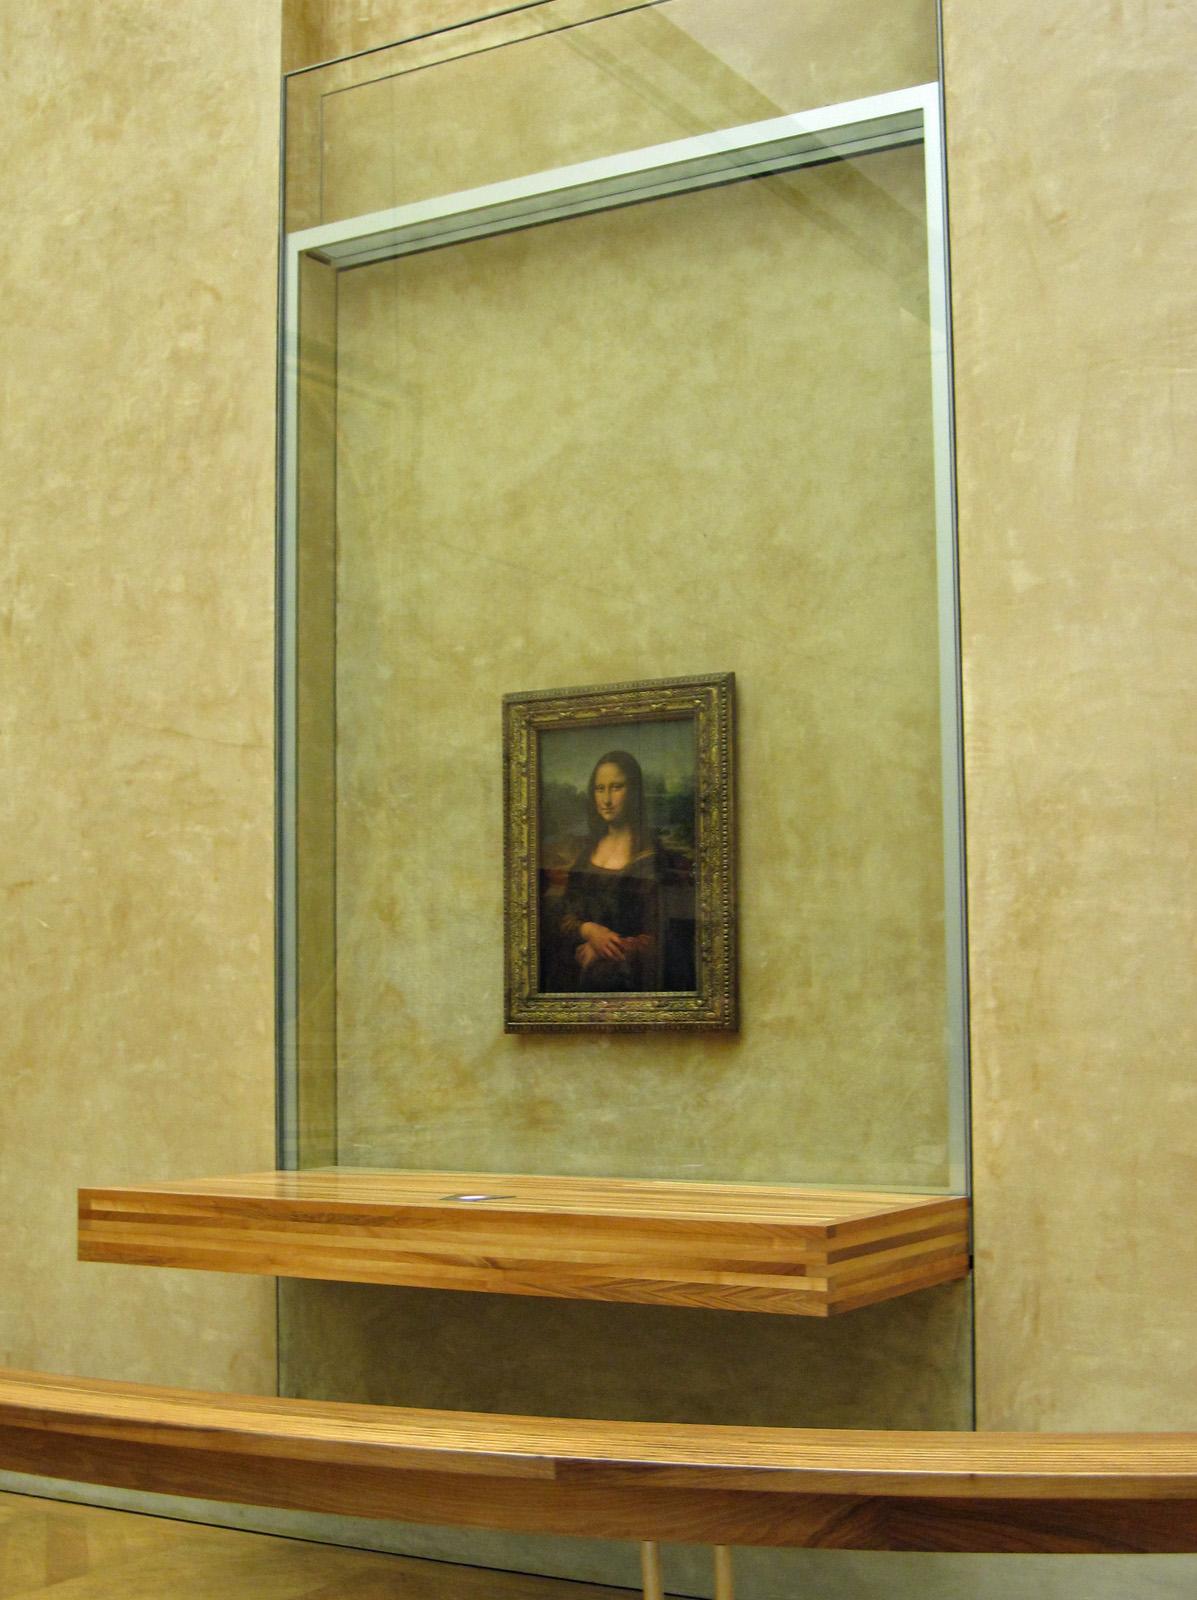 File:La Joconde (Le Louvre) (8226631218).jpg - Wikimedia Commons Da Vinci Mona Lisa